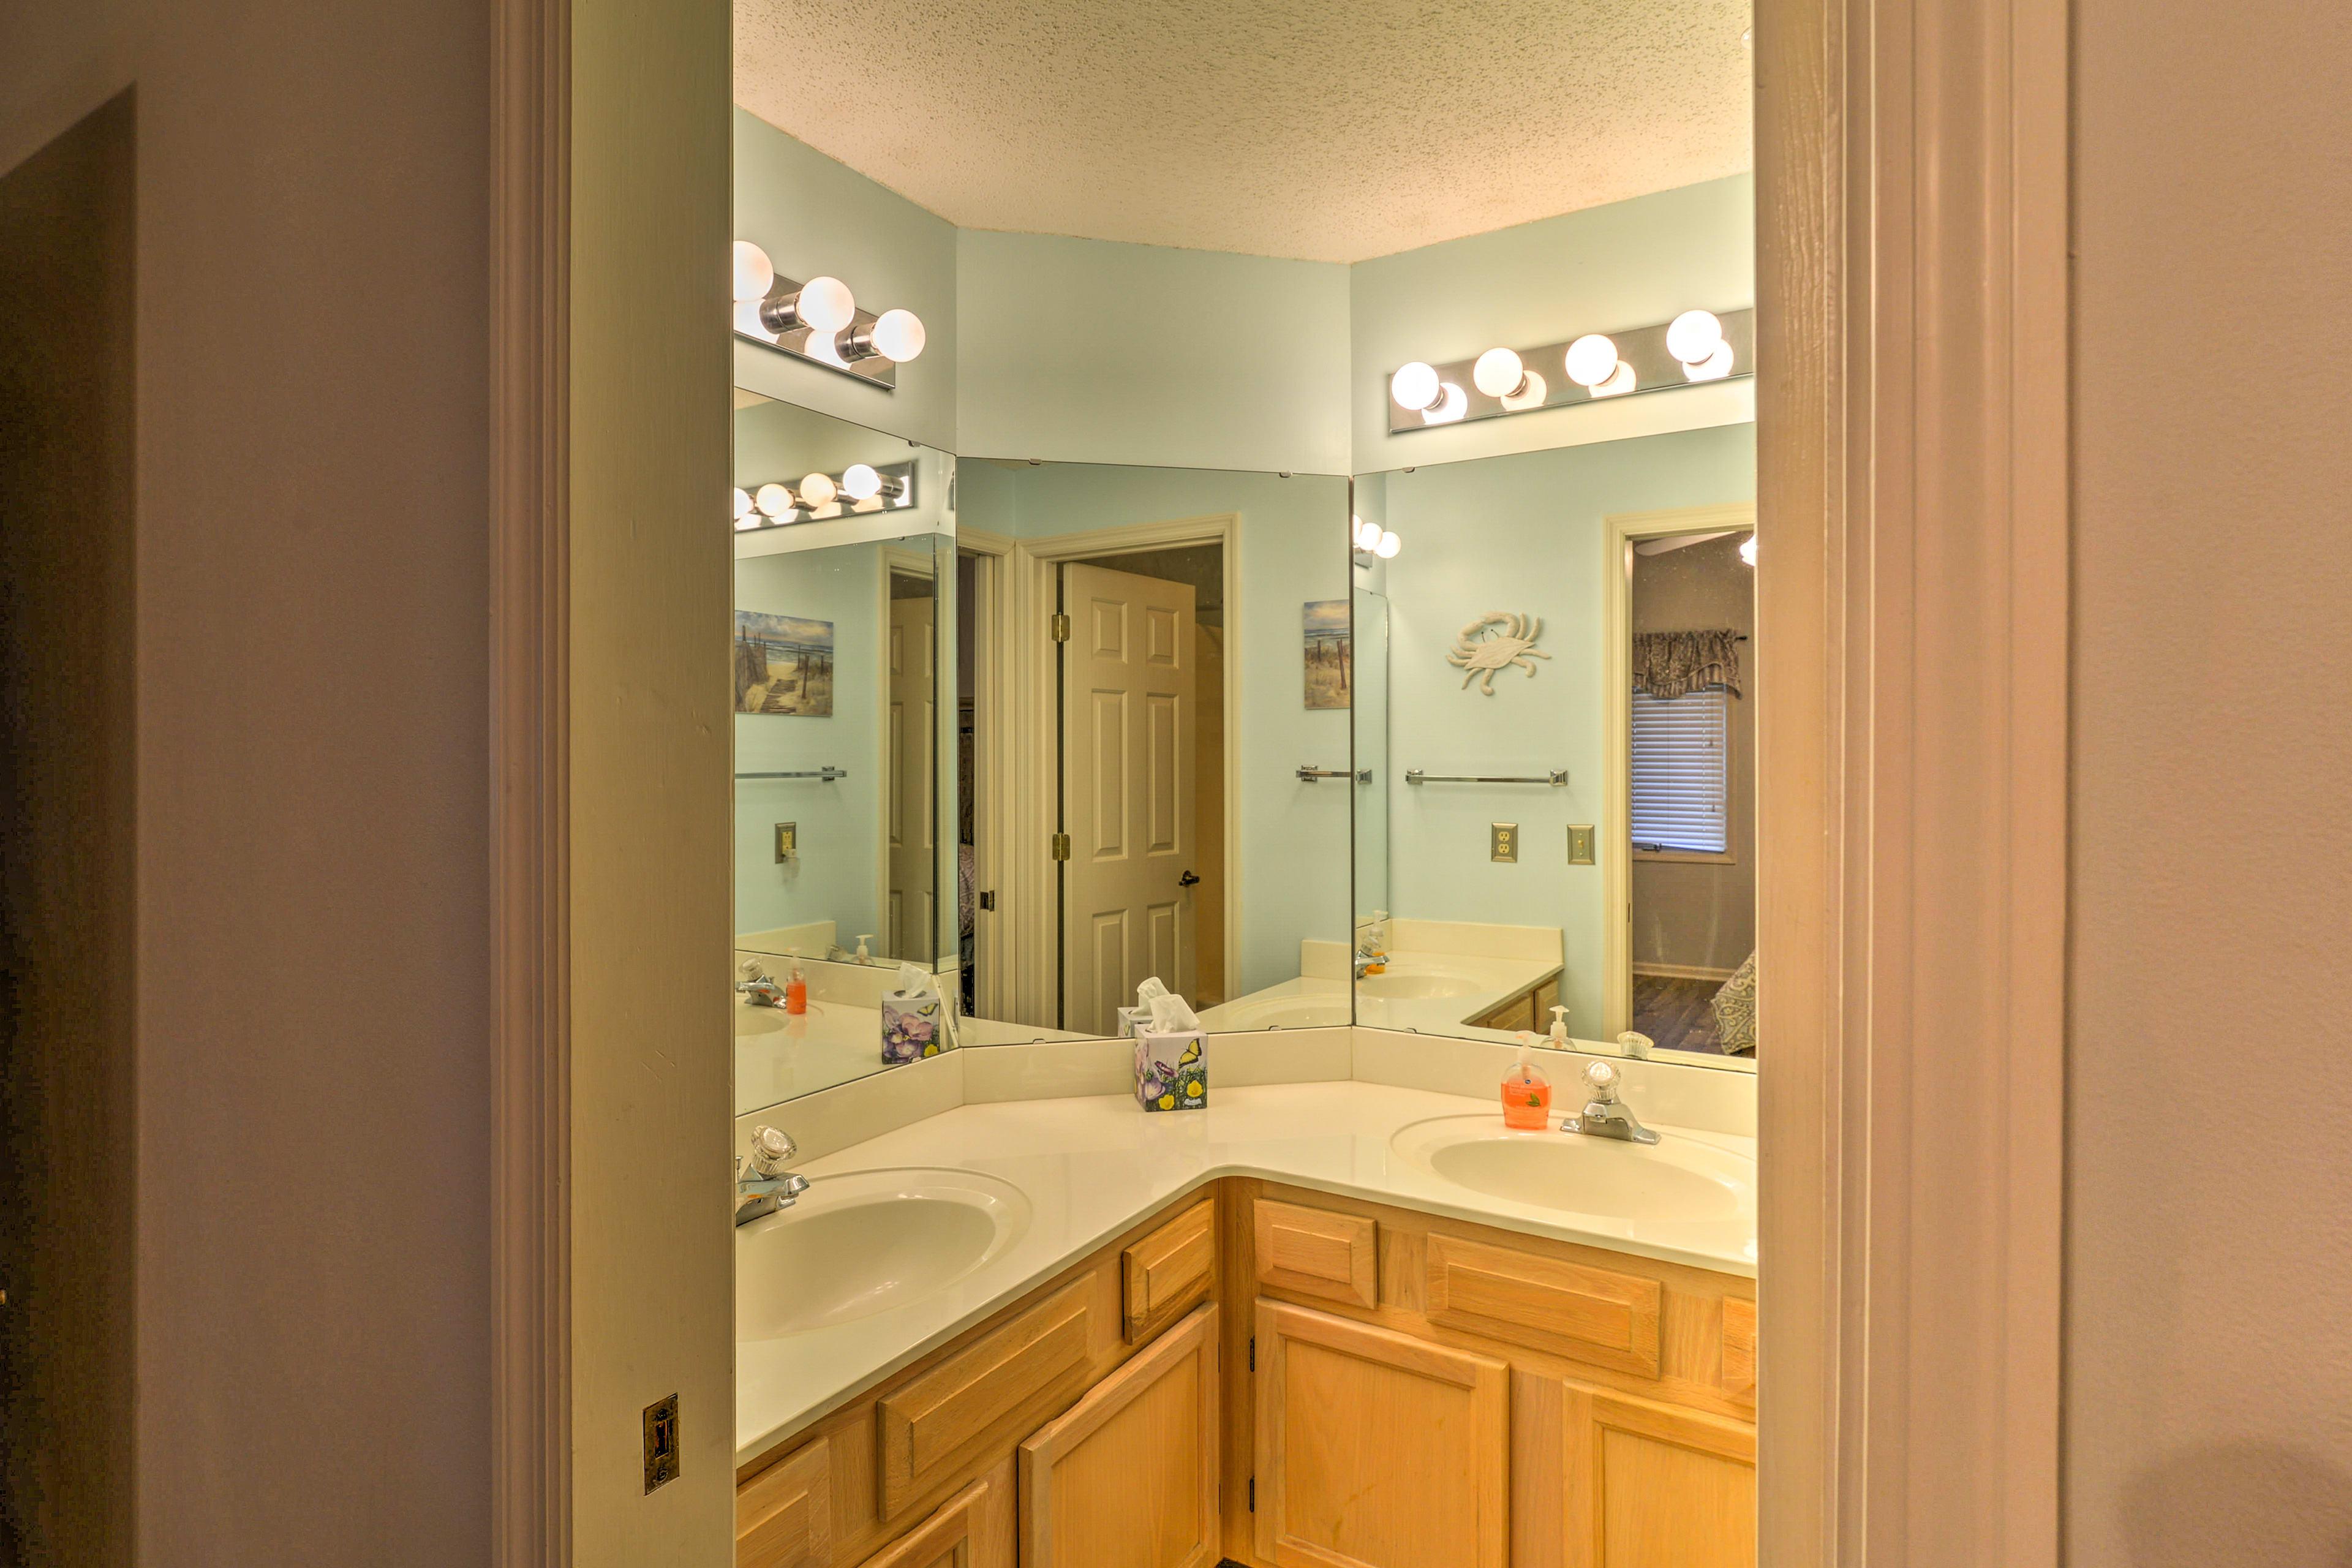 Rinse off in the en-suite bathroom.